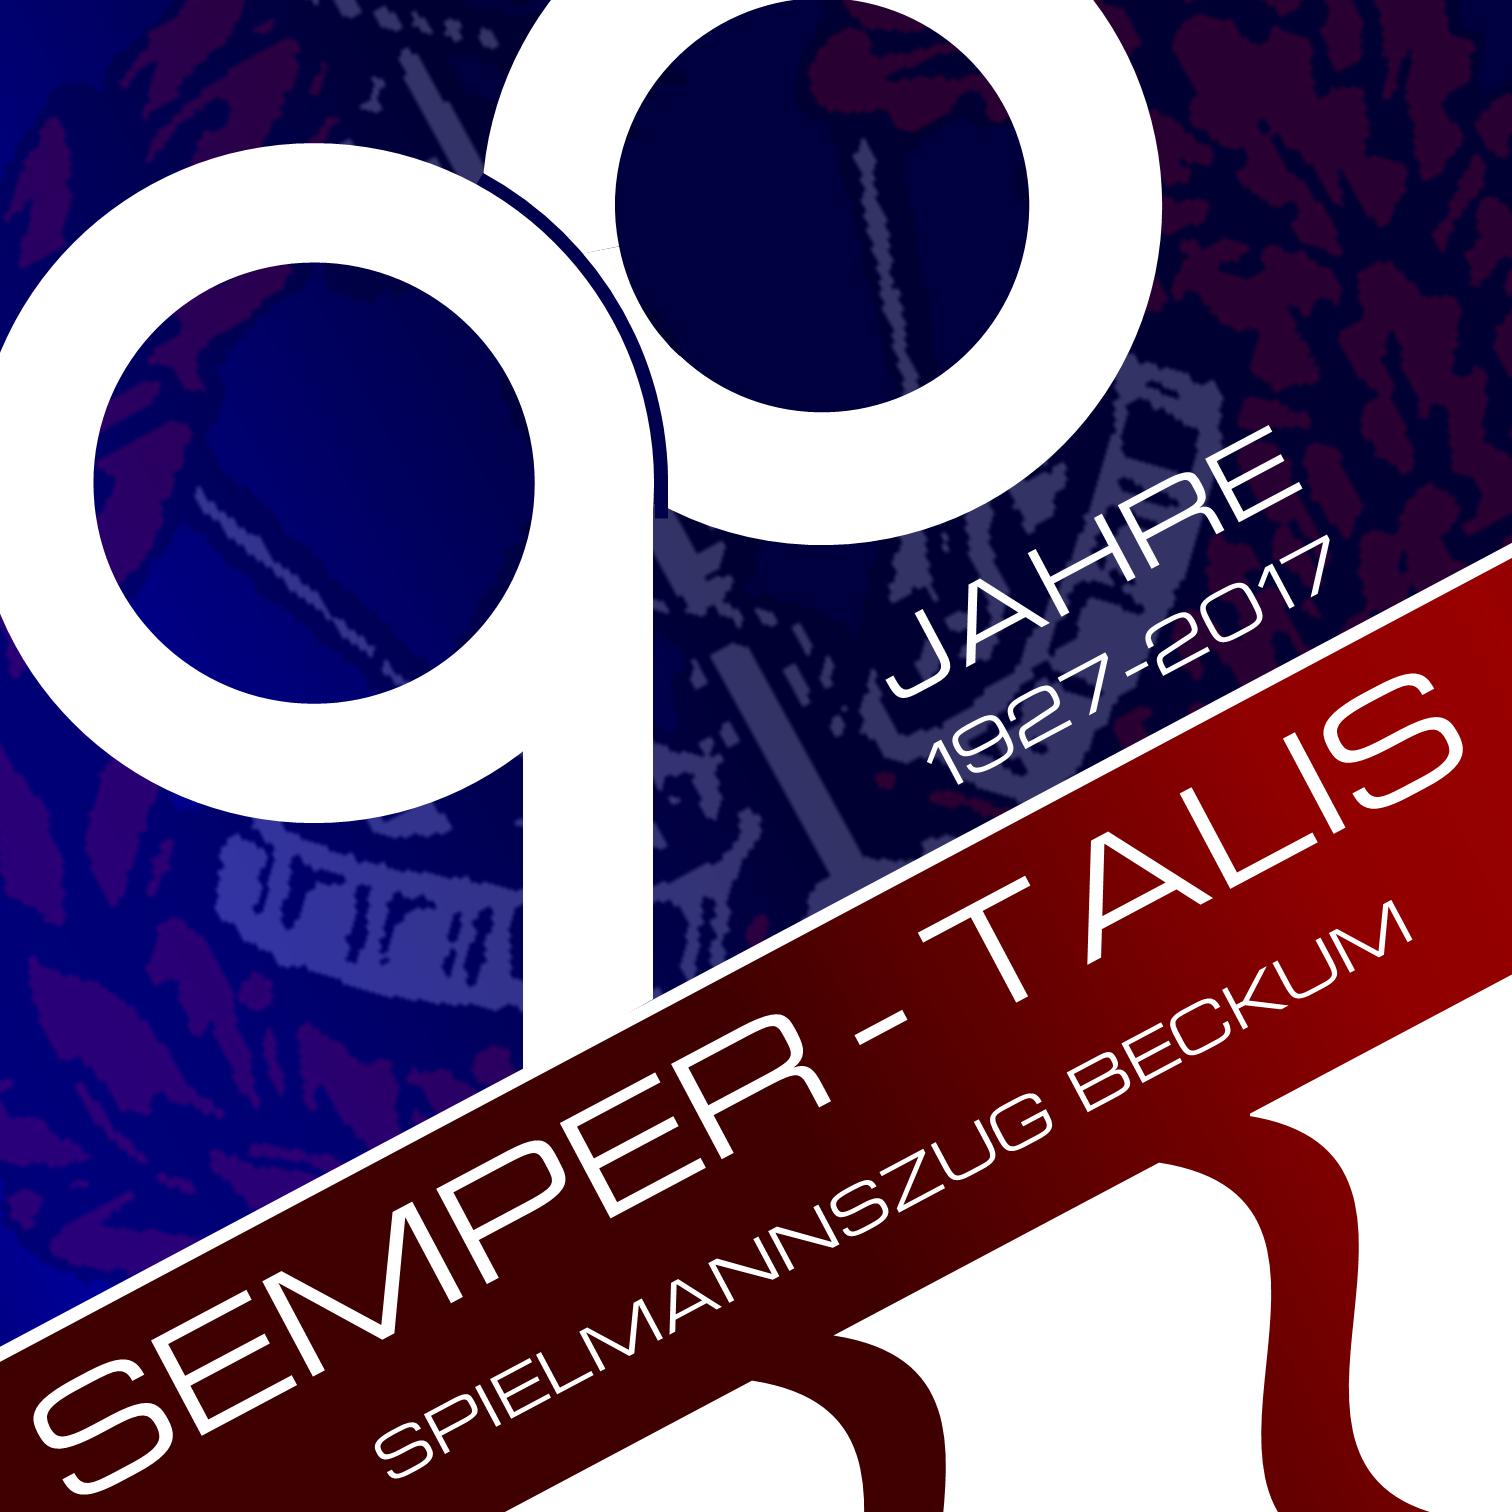 90 Jahre Semper-talis